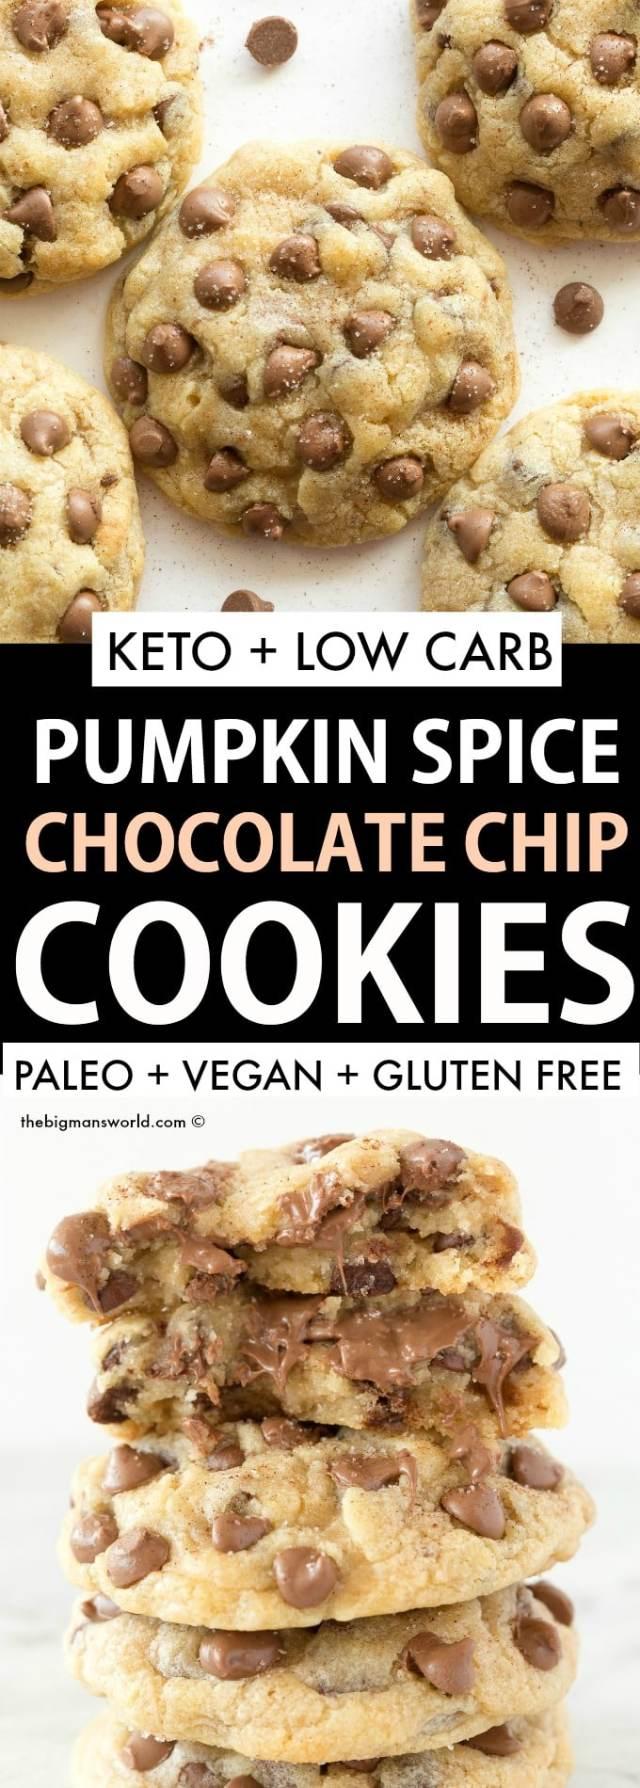 Keto Vegan Pumpkin Spice Chocolate Chip Cookies Recipe